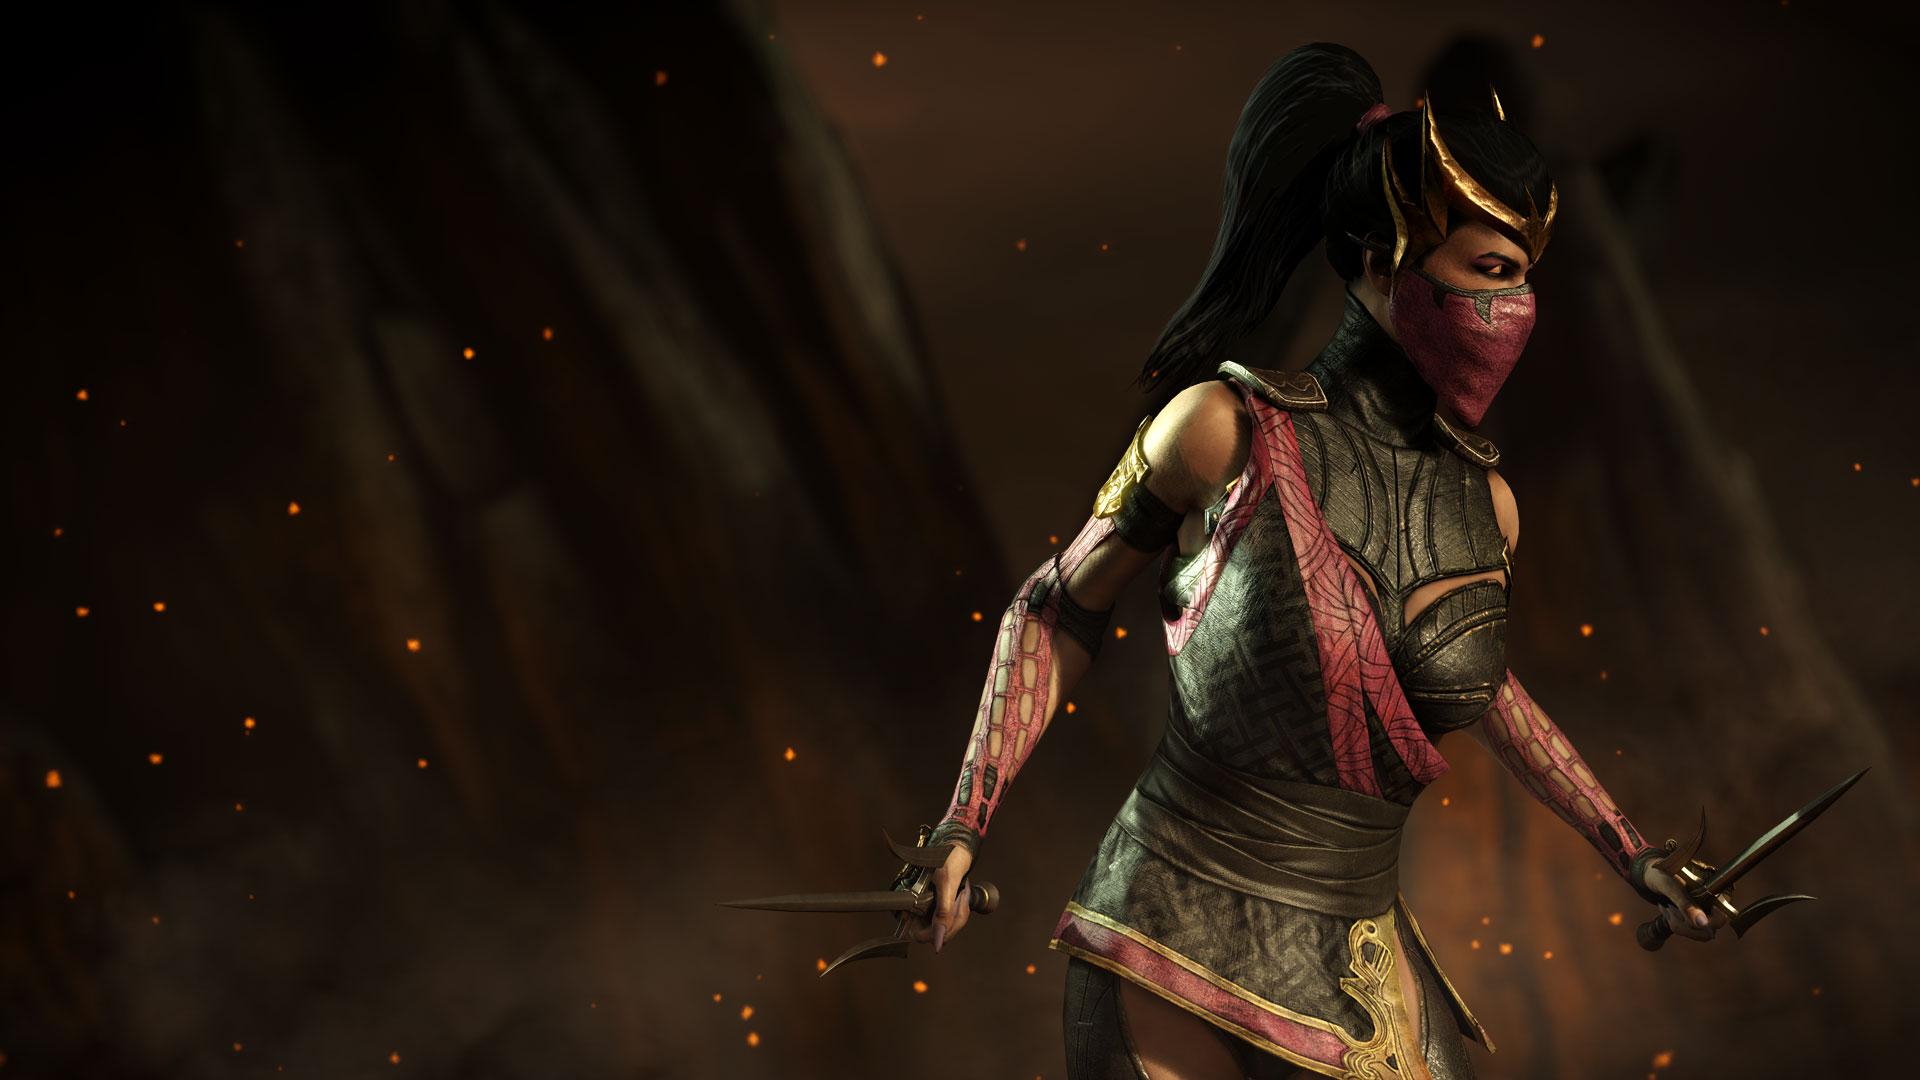 Hd Art Wallpapers For Mobile Mkwarehouse Mortal Kombat X Mileena